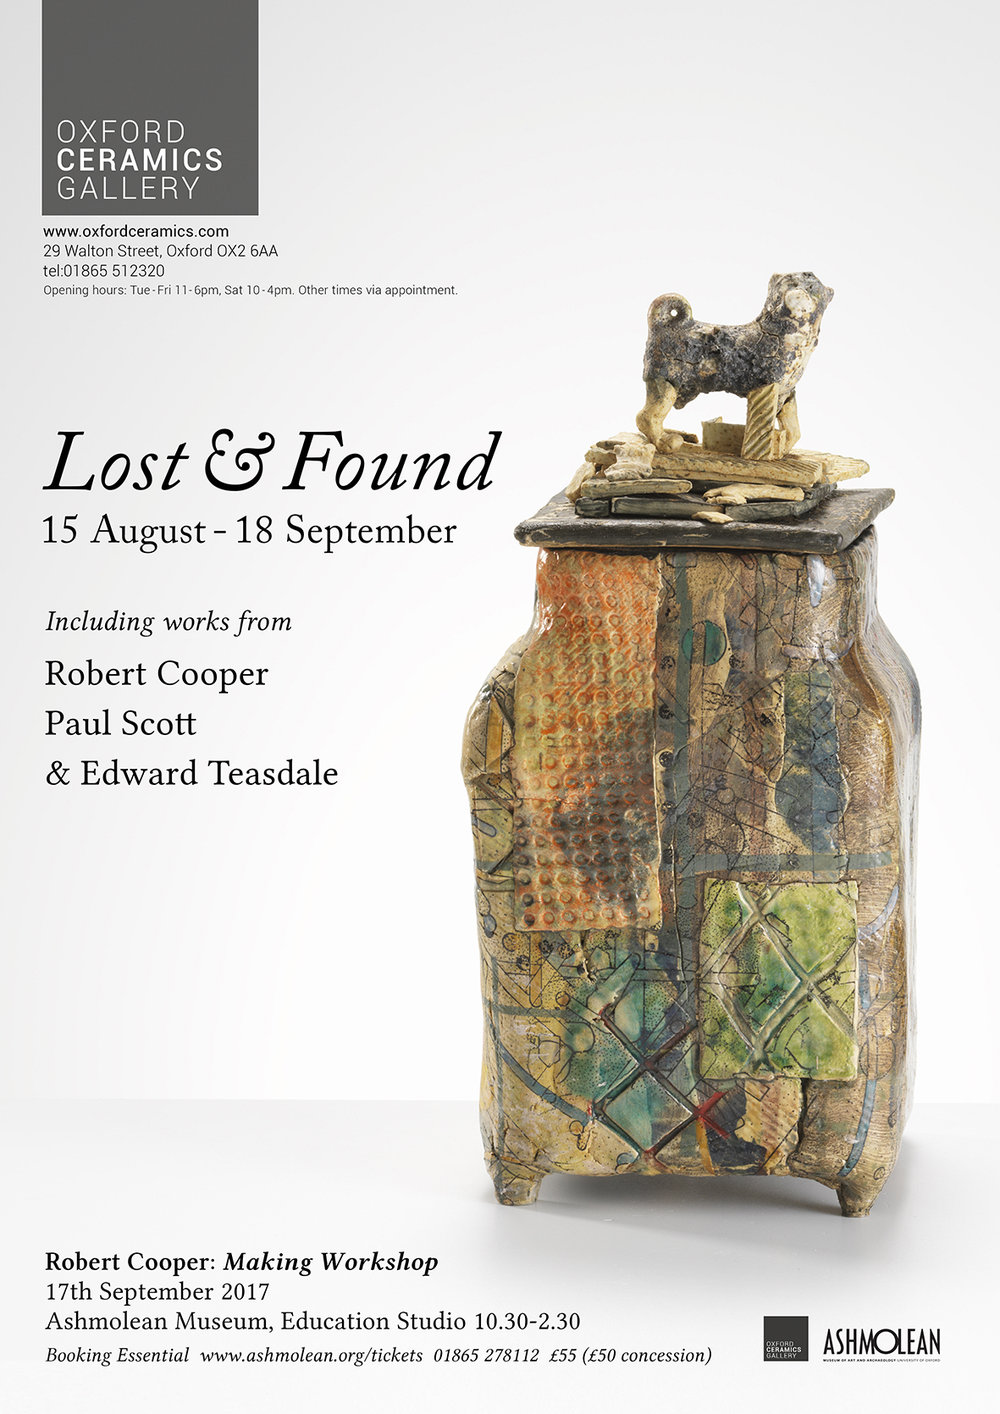 Lost & Found Poster1.jpg